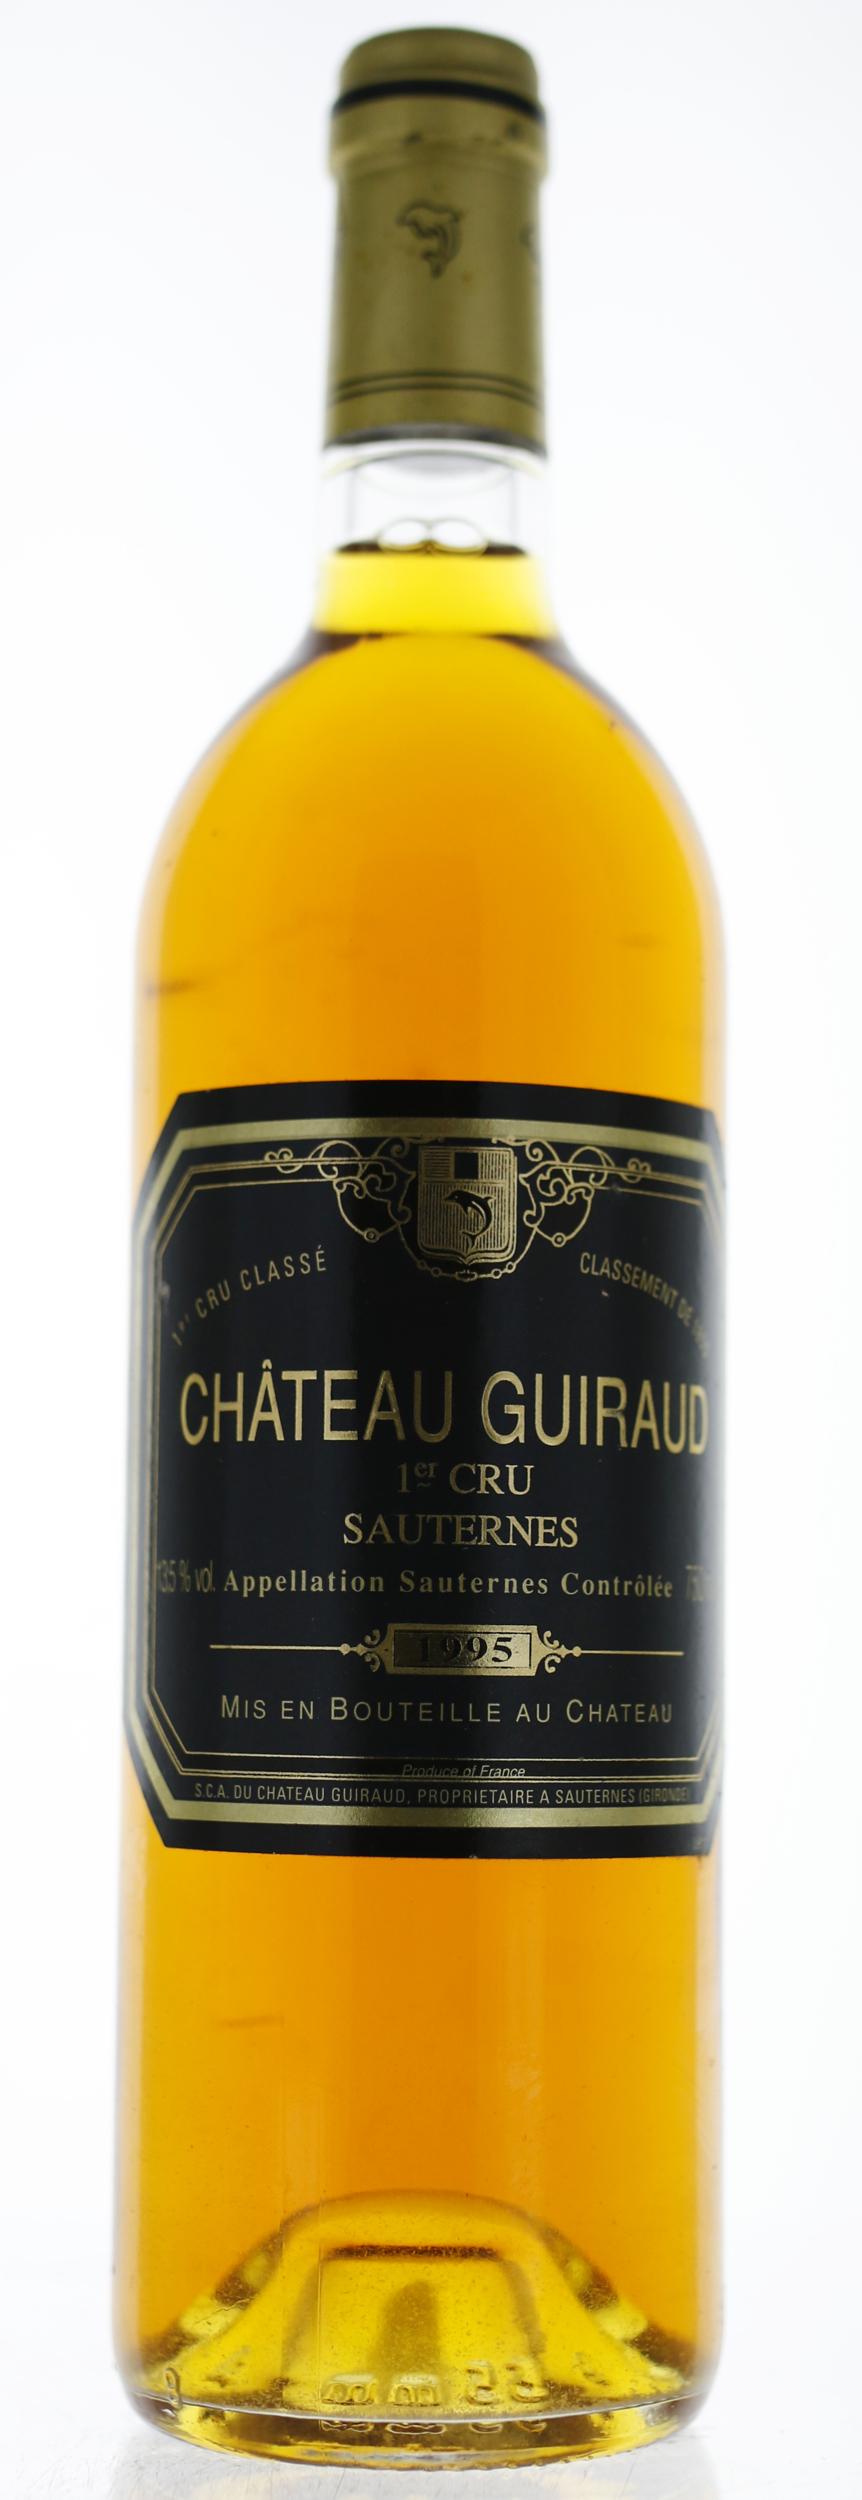 Sauternes - Château Guiraud - 1995